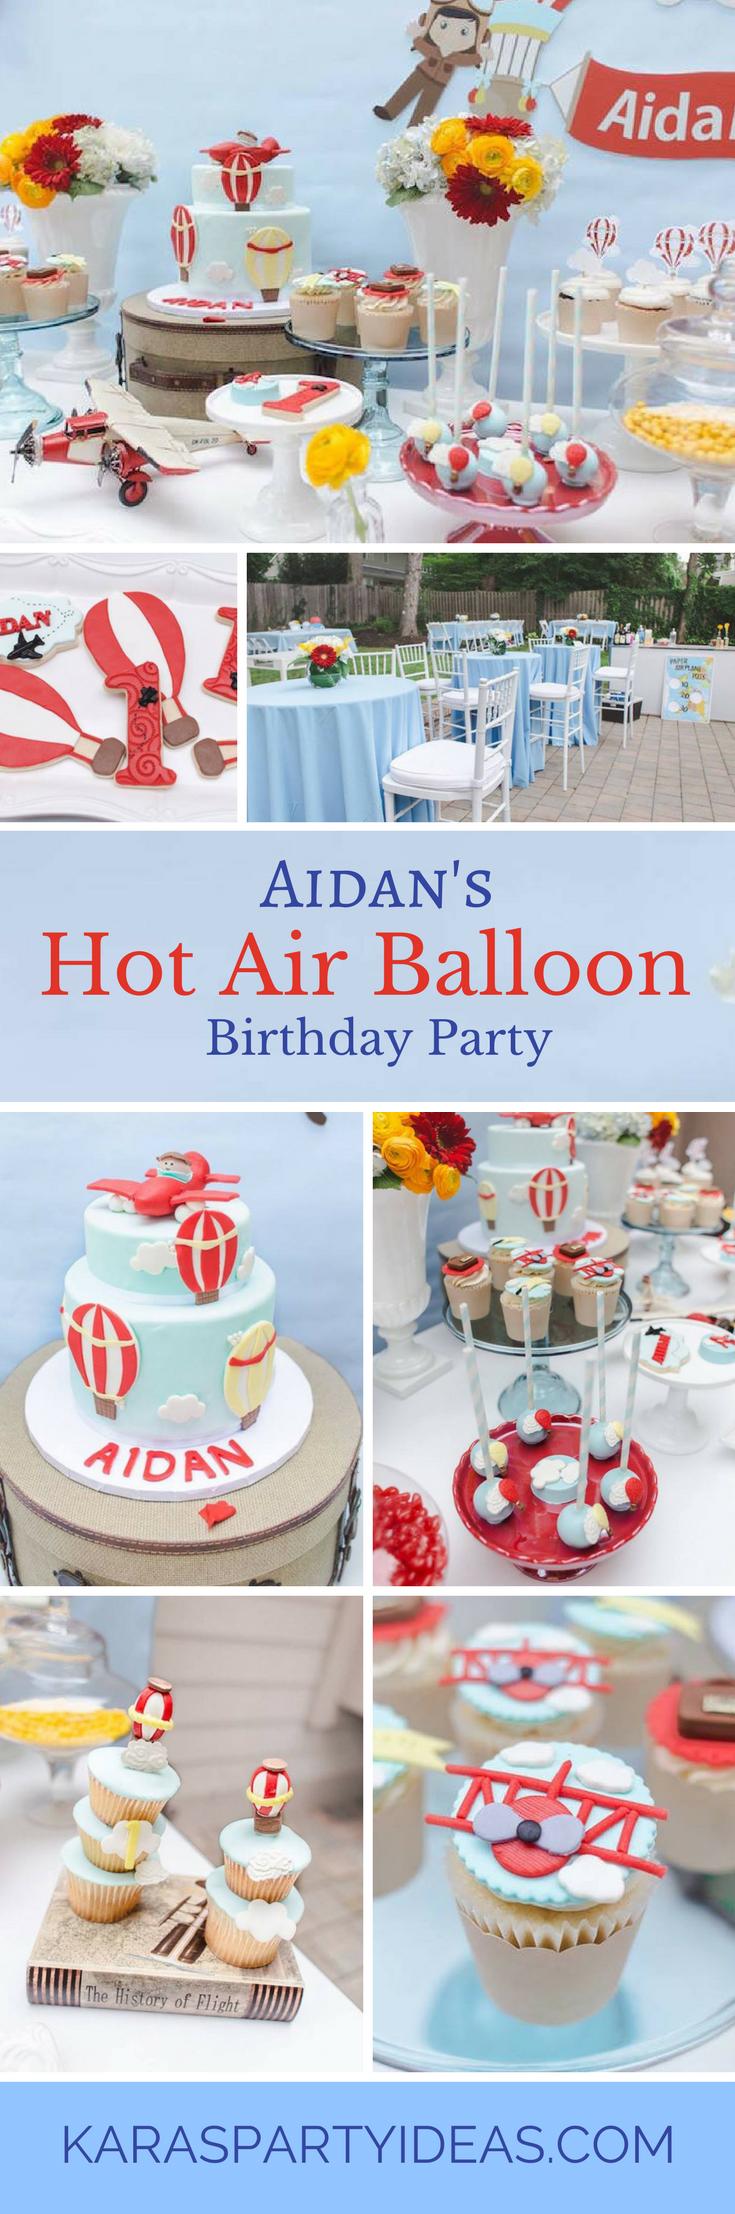 Aidans Hot Air Balloon Birthday Party - Karas Party Ideas via KarasPartyIdeas.com